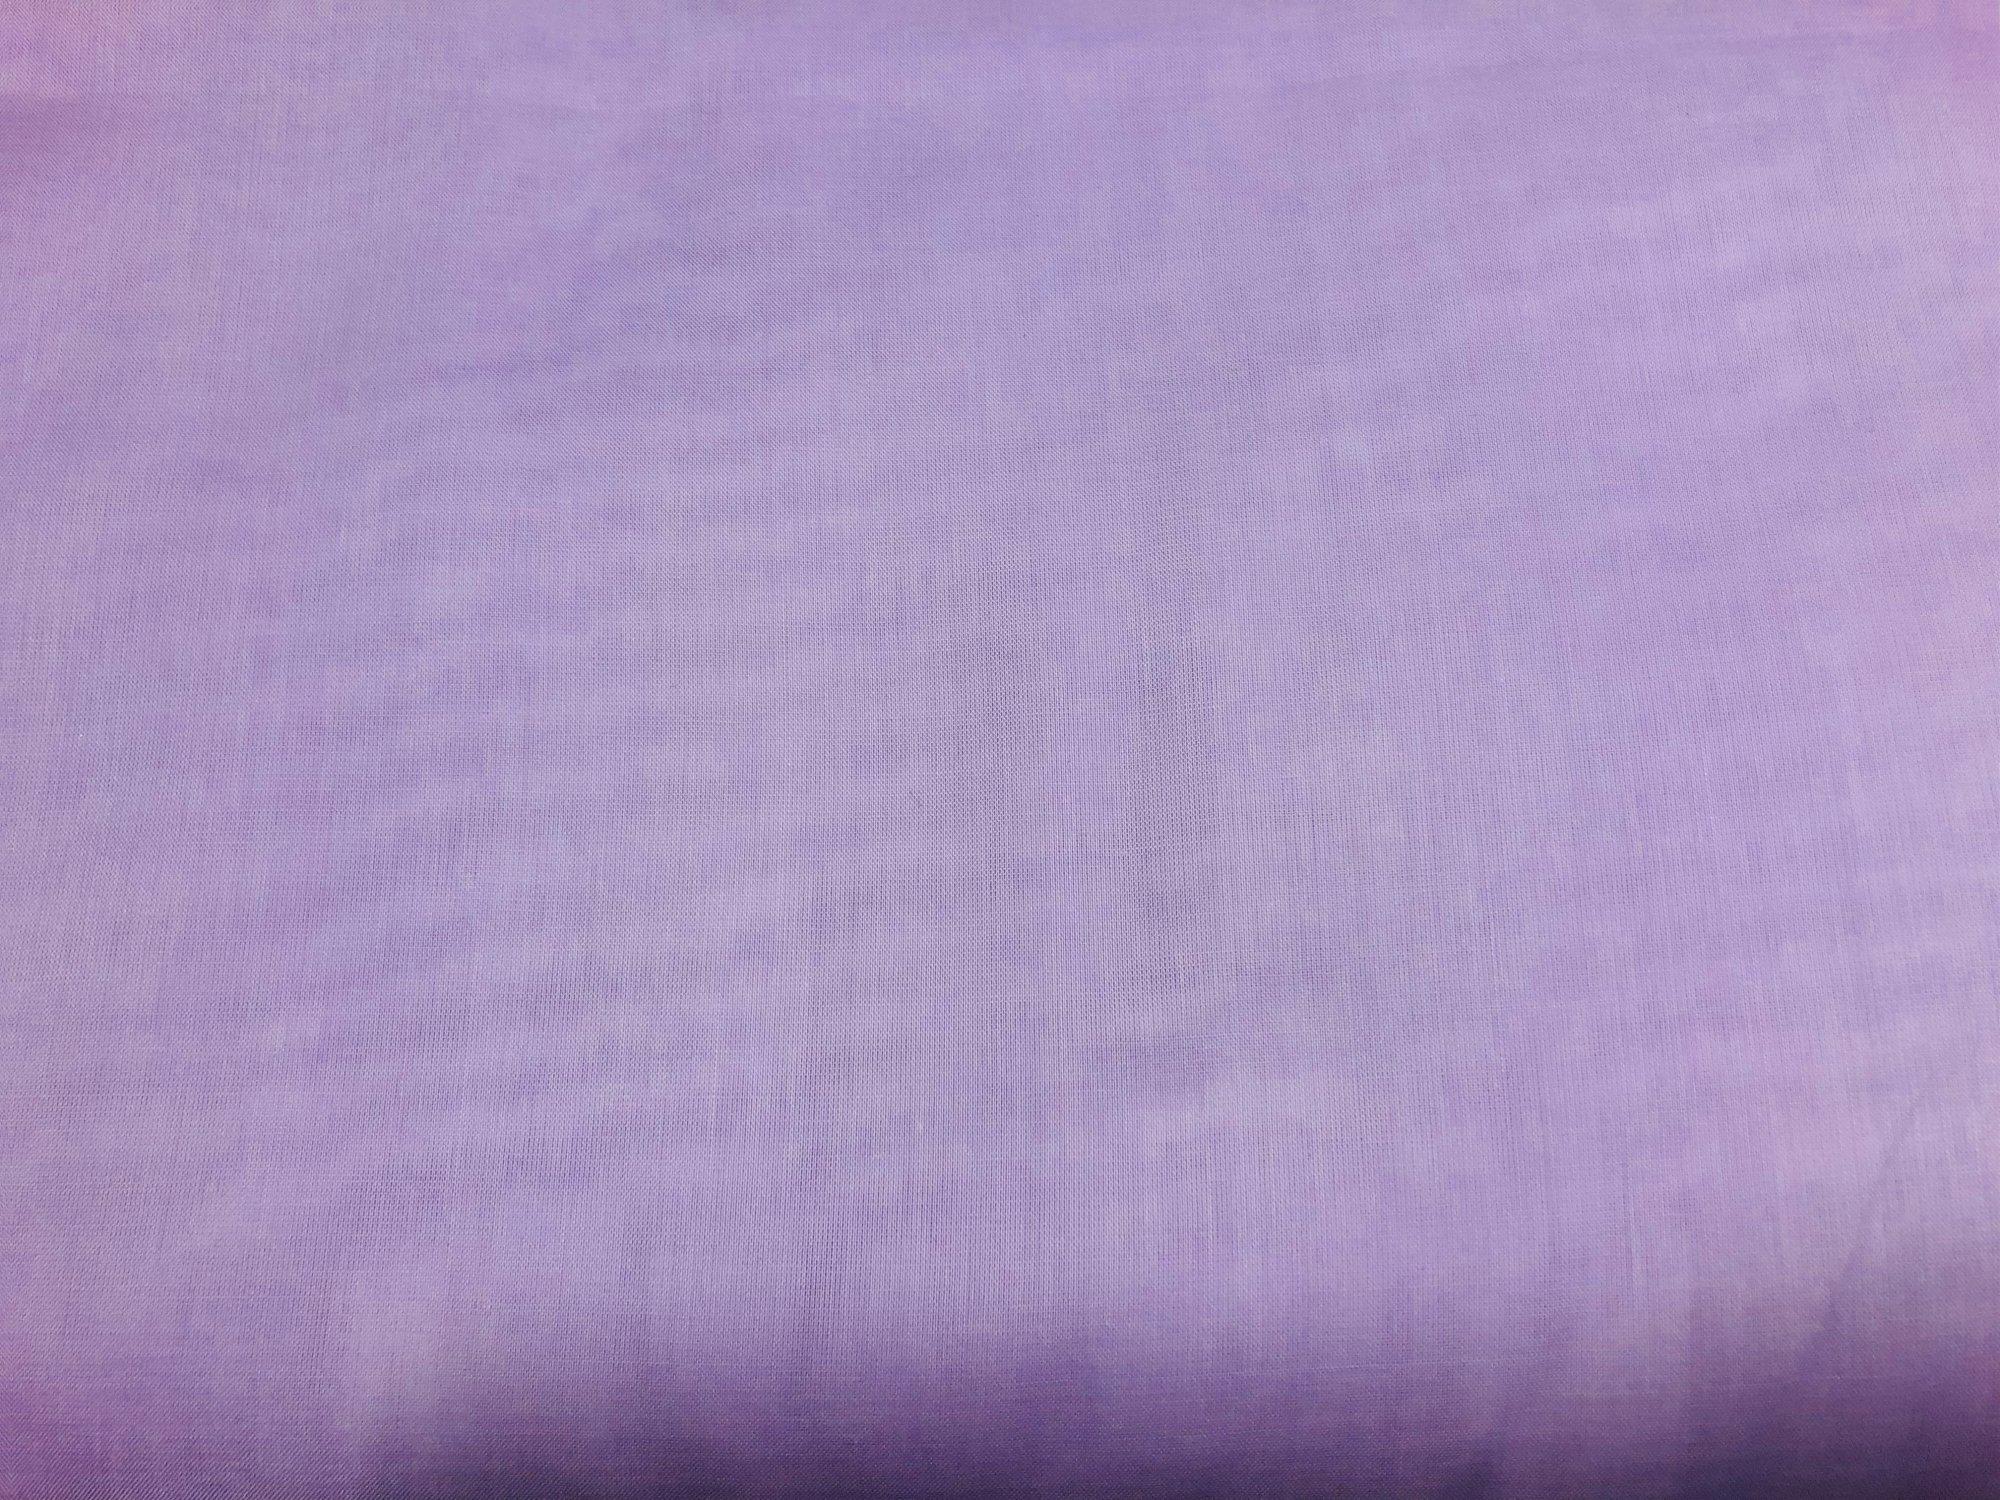 Nelona Swiss Pima Batiste Lilac Fabric by Spechler-Vogel